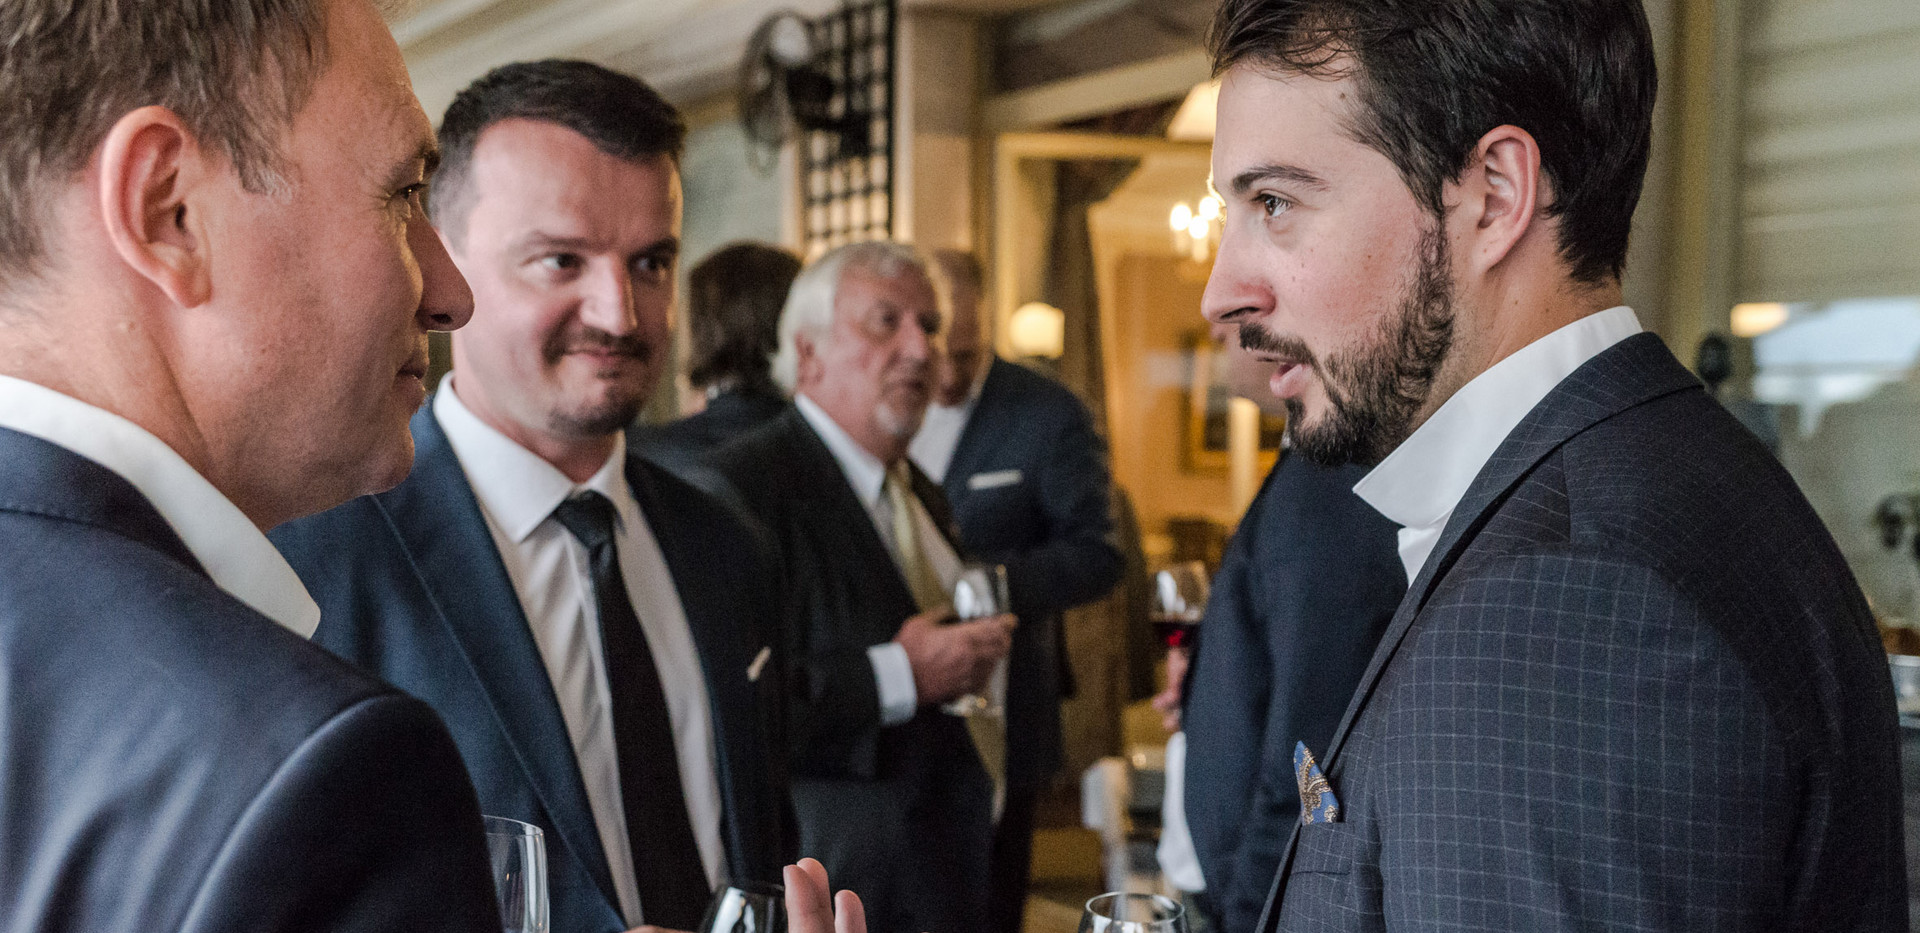 Meeting Alitavia - Mandat pour l'hotel Beau-Rivage (2019)